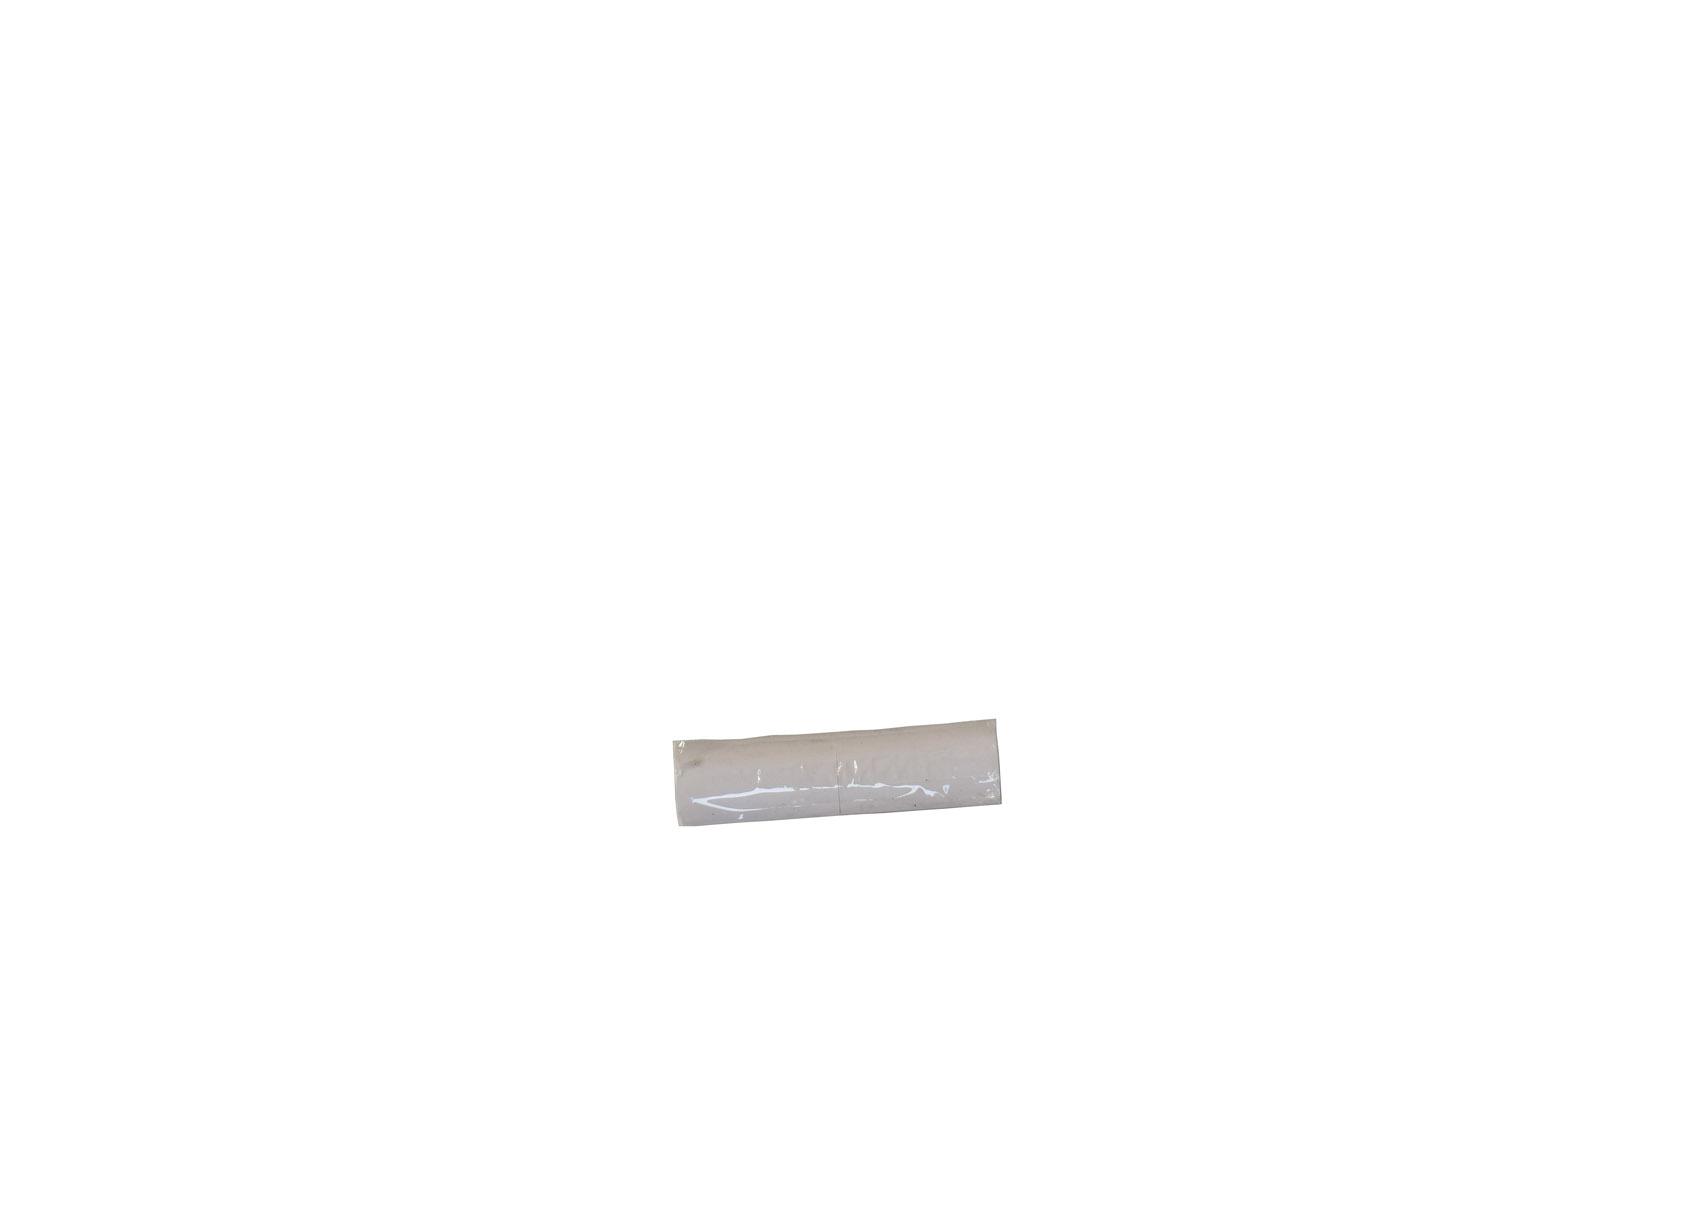 YTC620B氧化锌避雷器直流参数测试仪打印纸